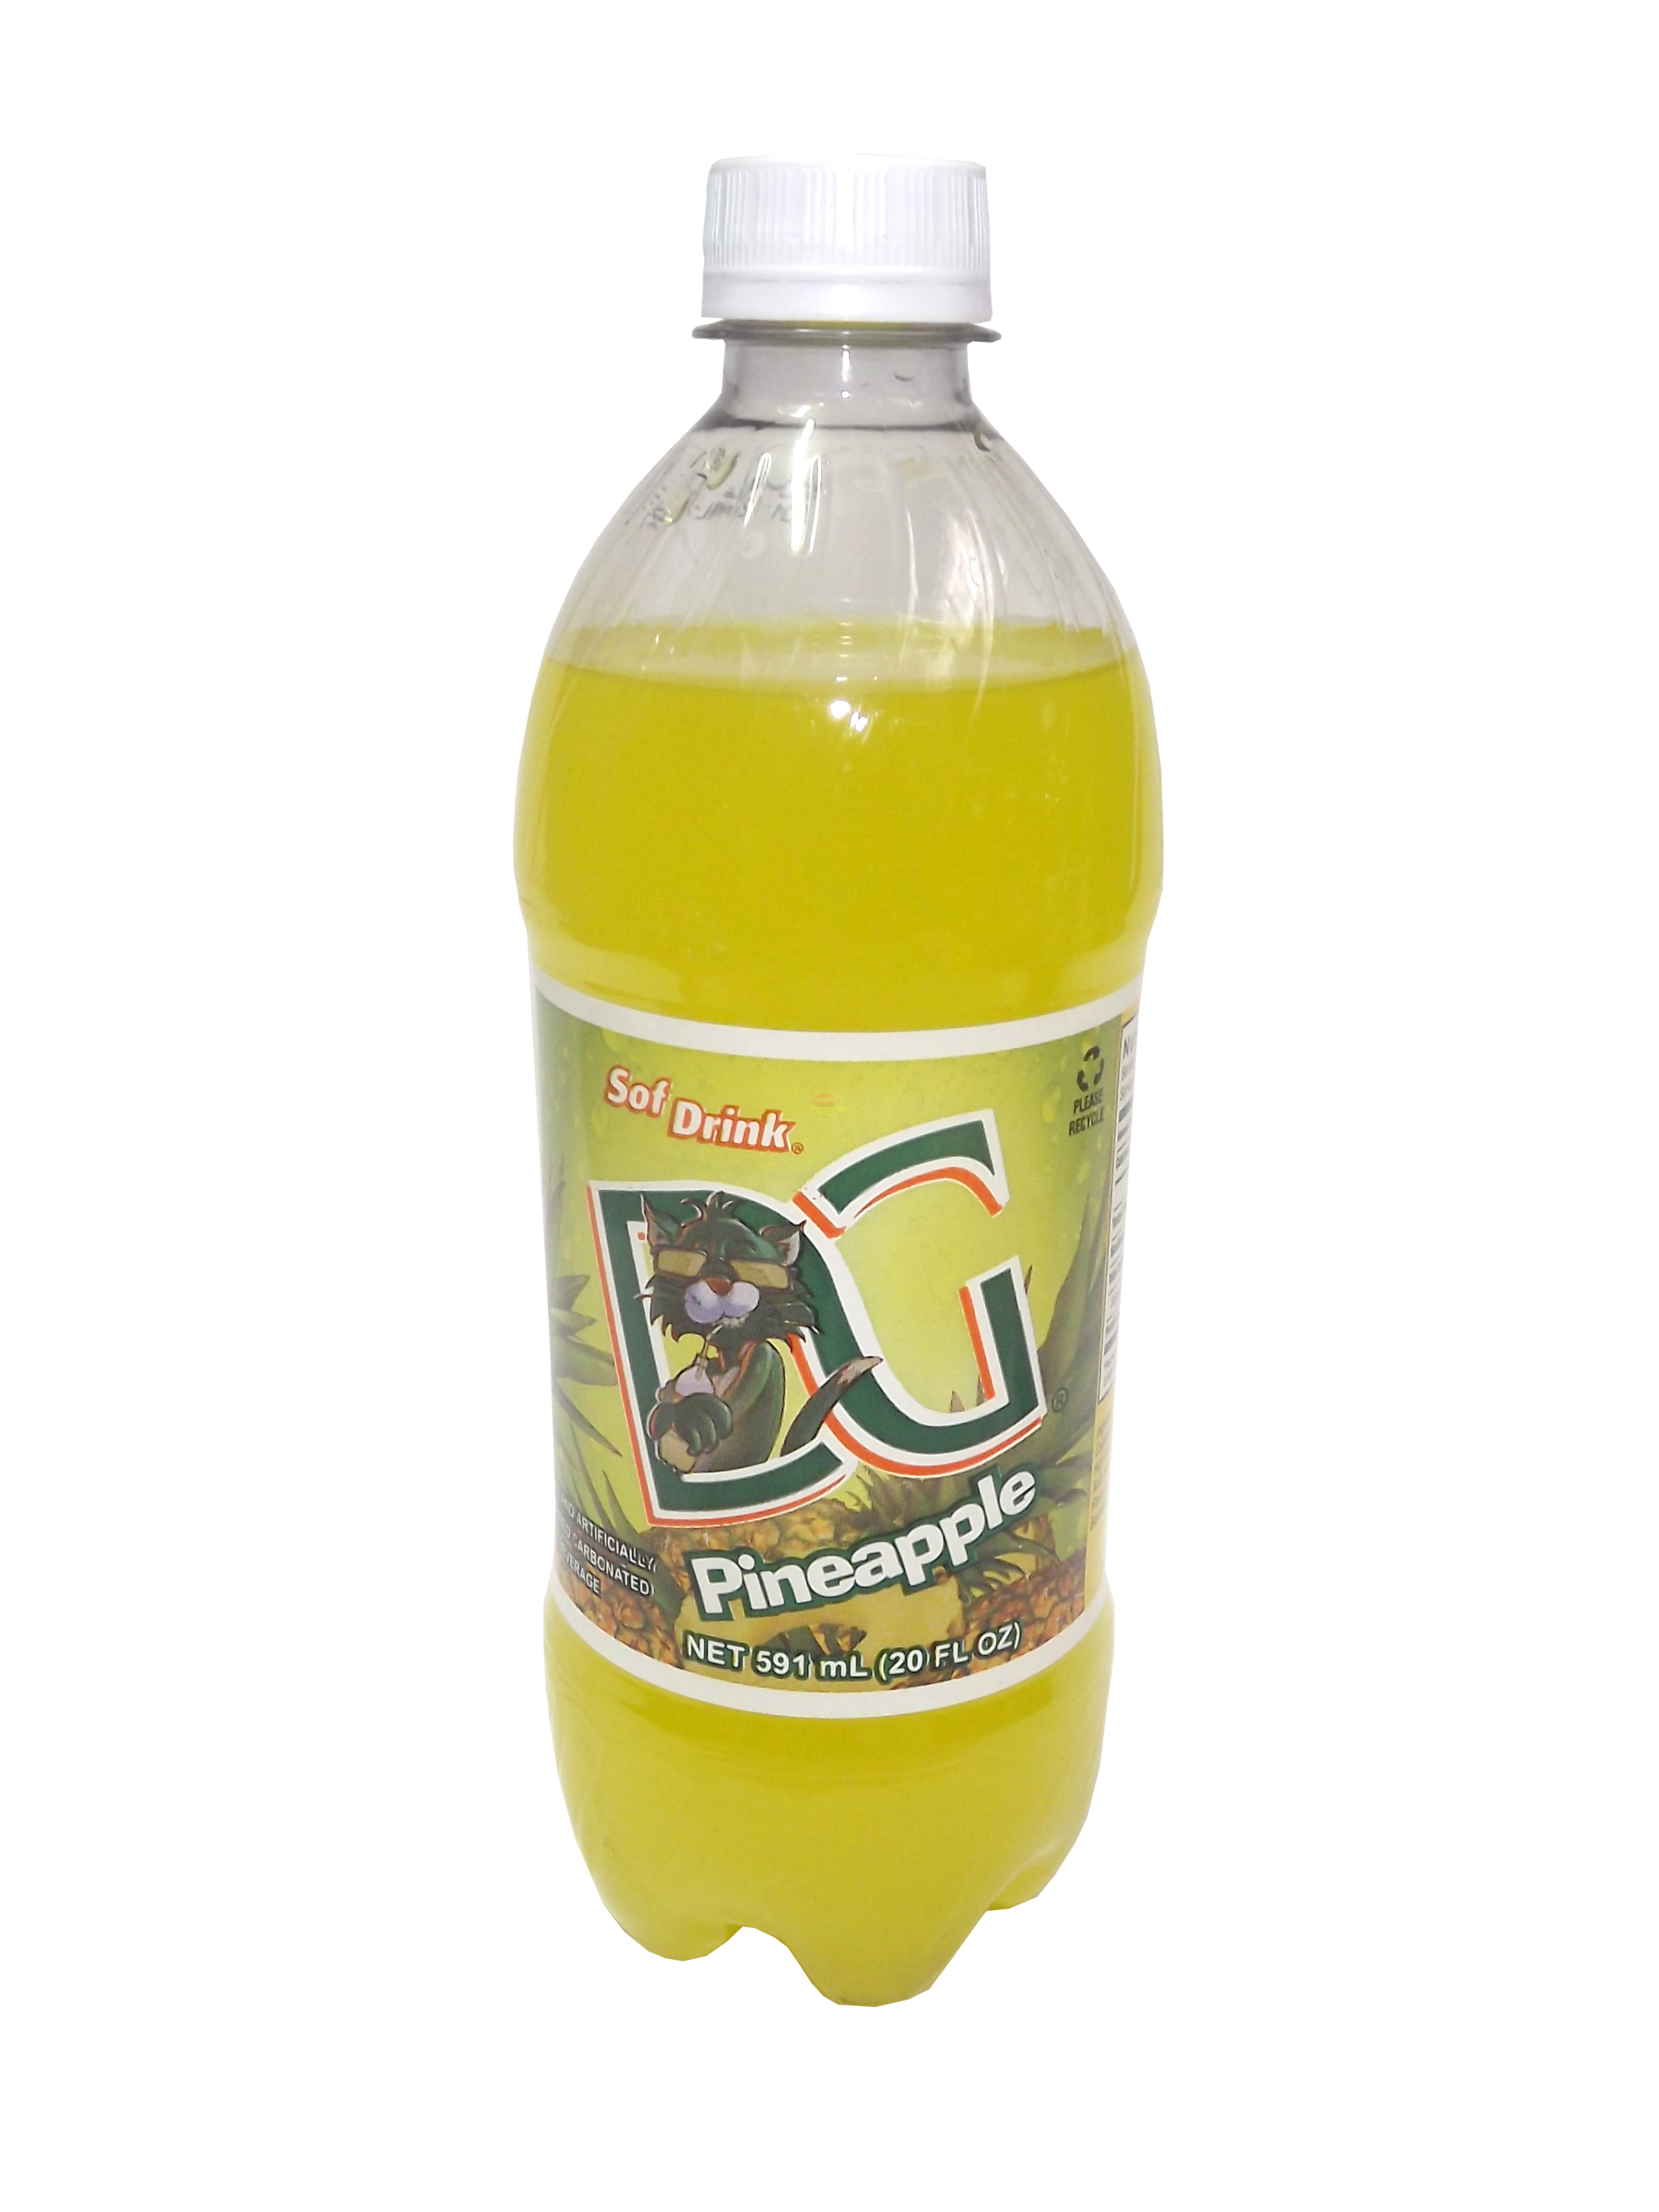 D&G Sof Drink Pineapple 591ml